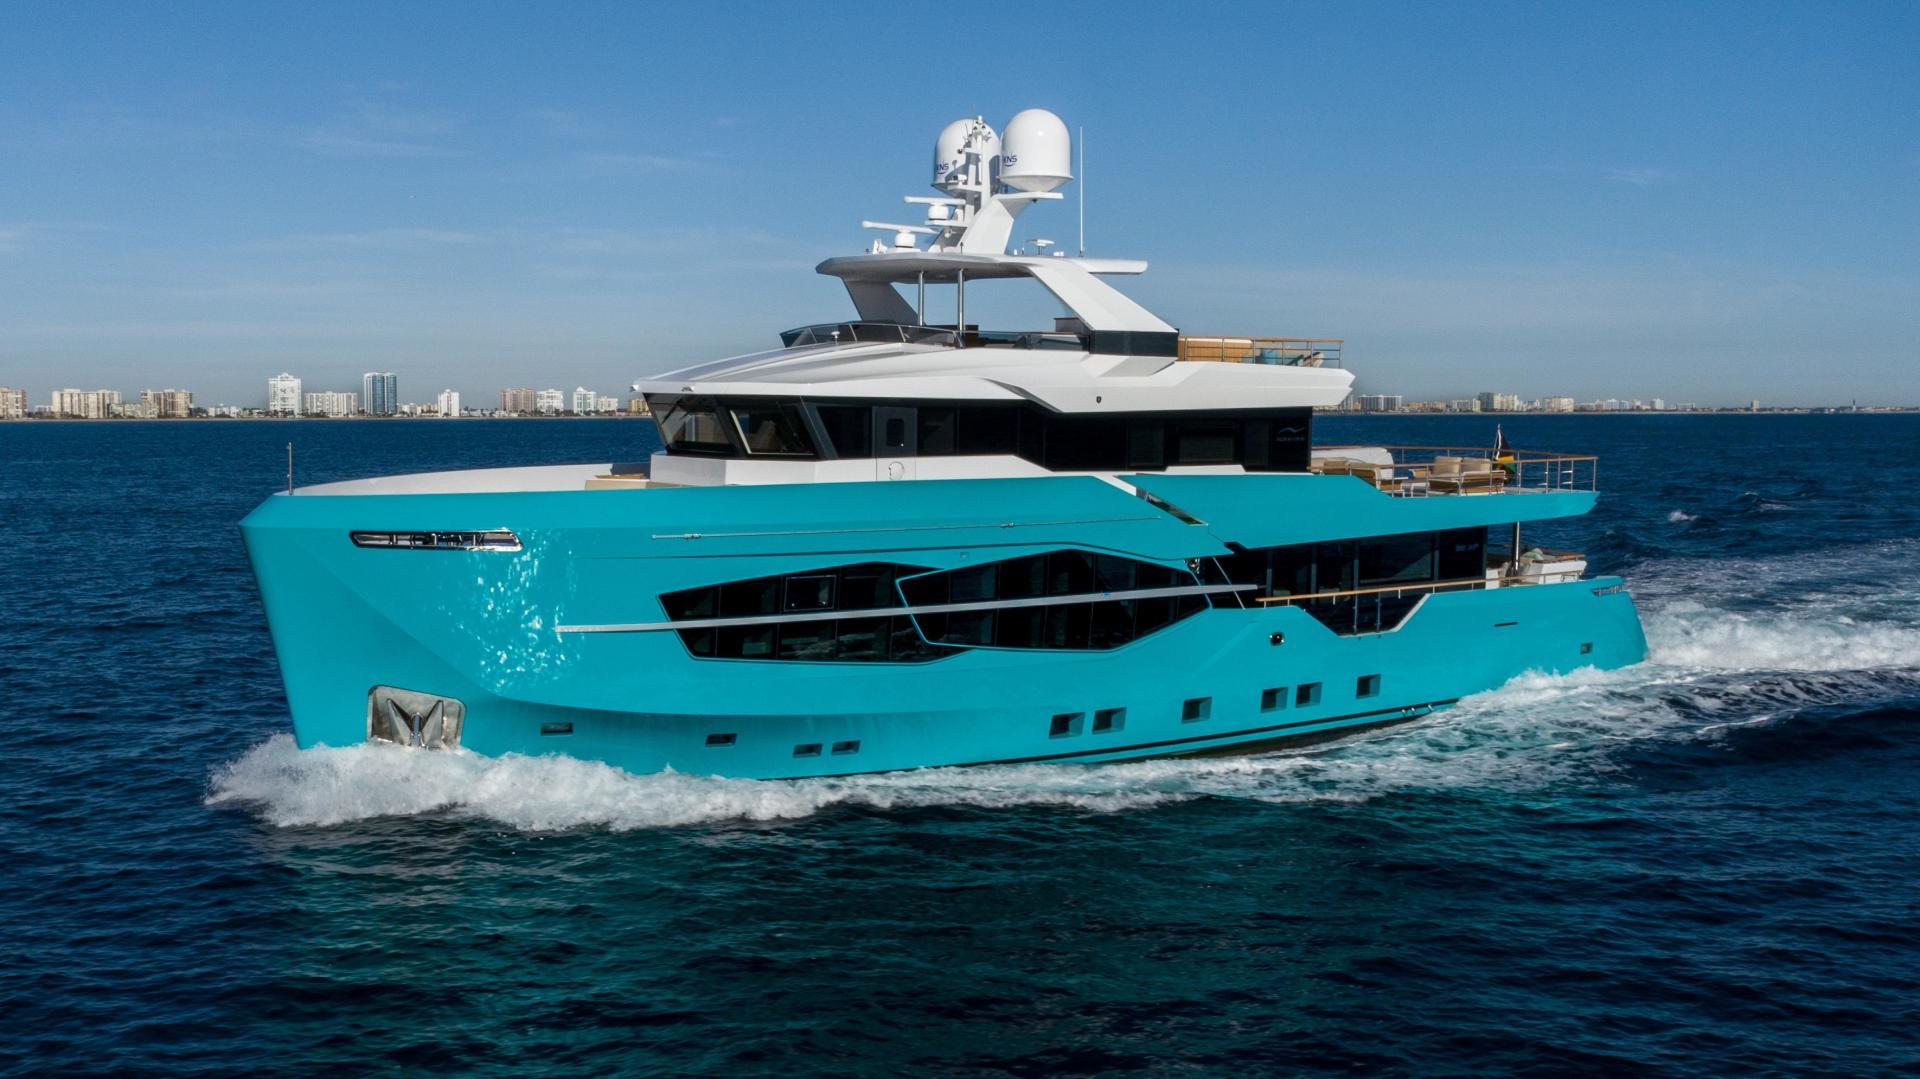 Numarine-32XP 2020-7 Diamonds Fort Lauderdale-Florida-United States-1629332 | Thumbnail